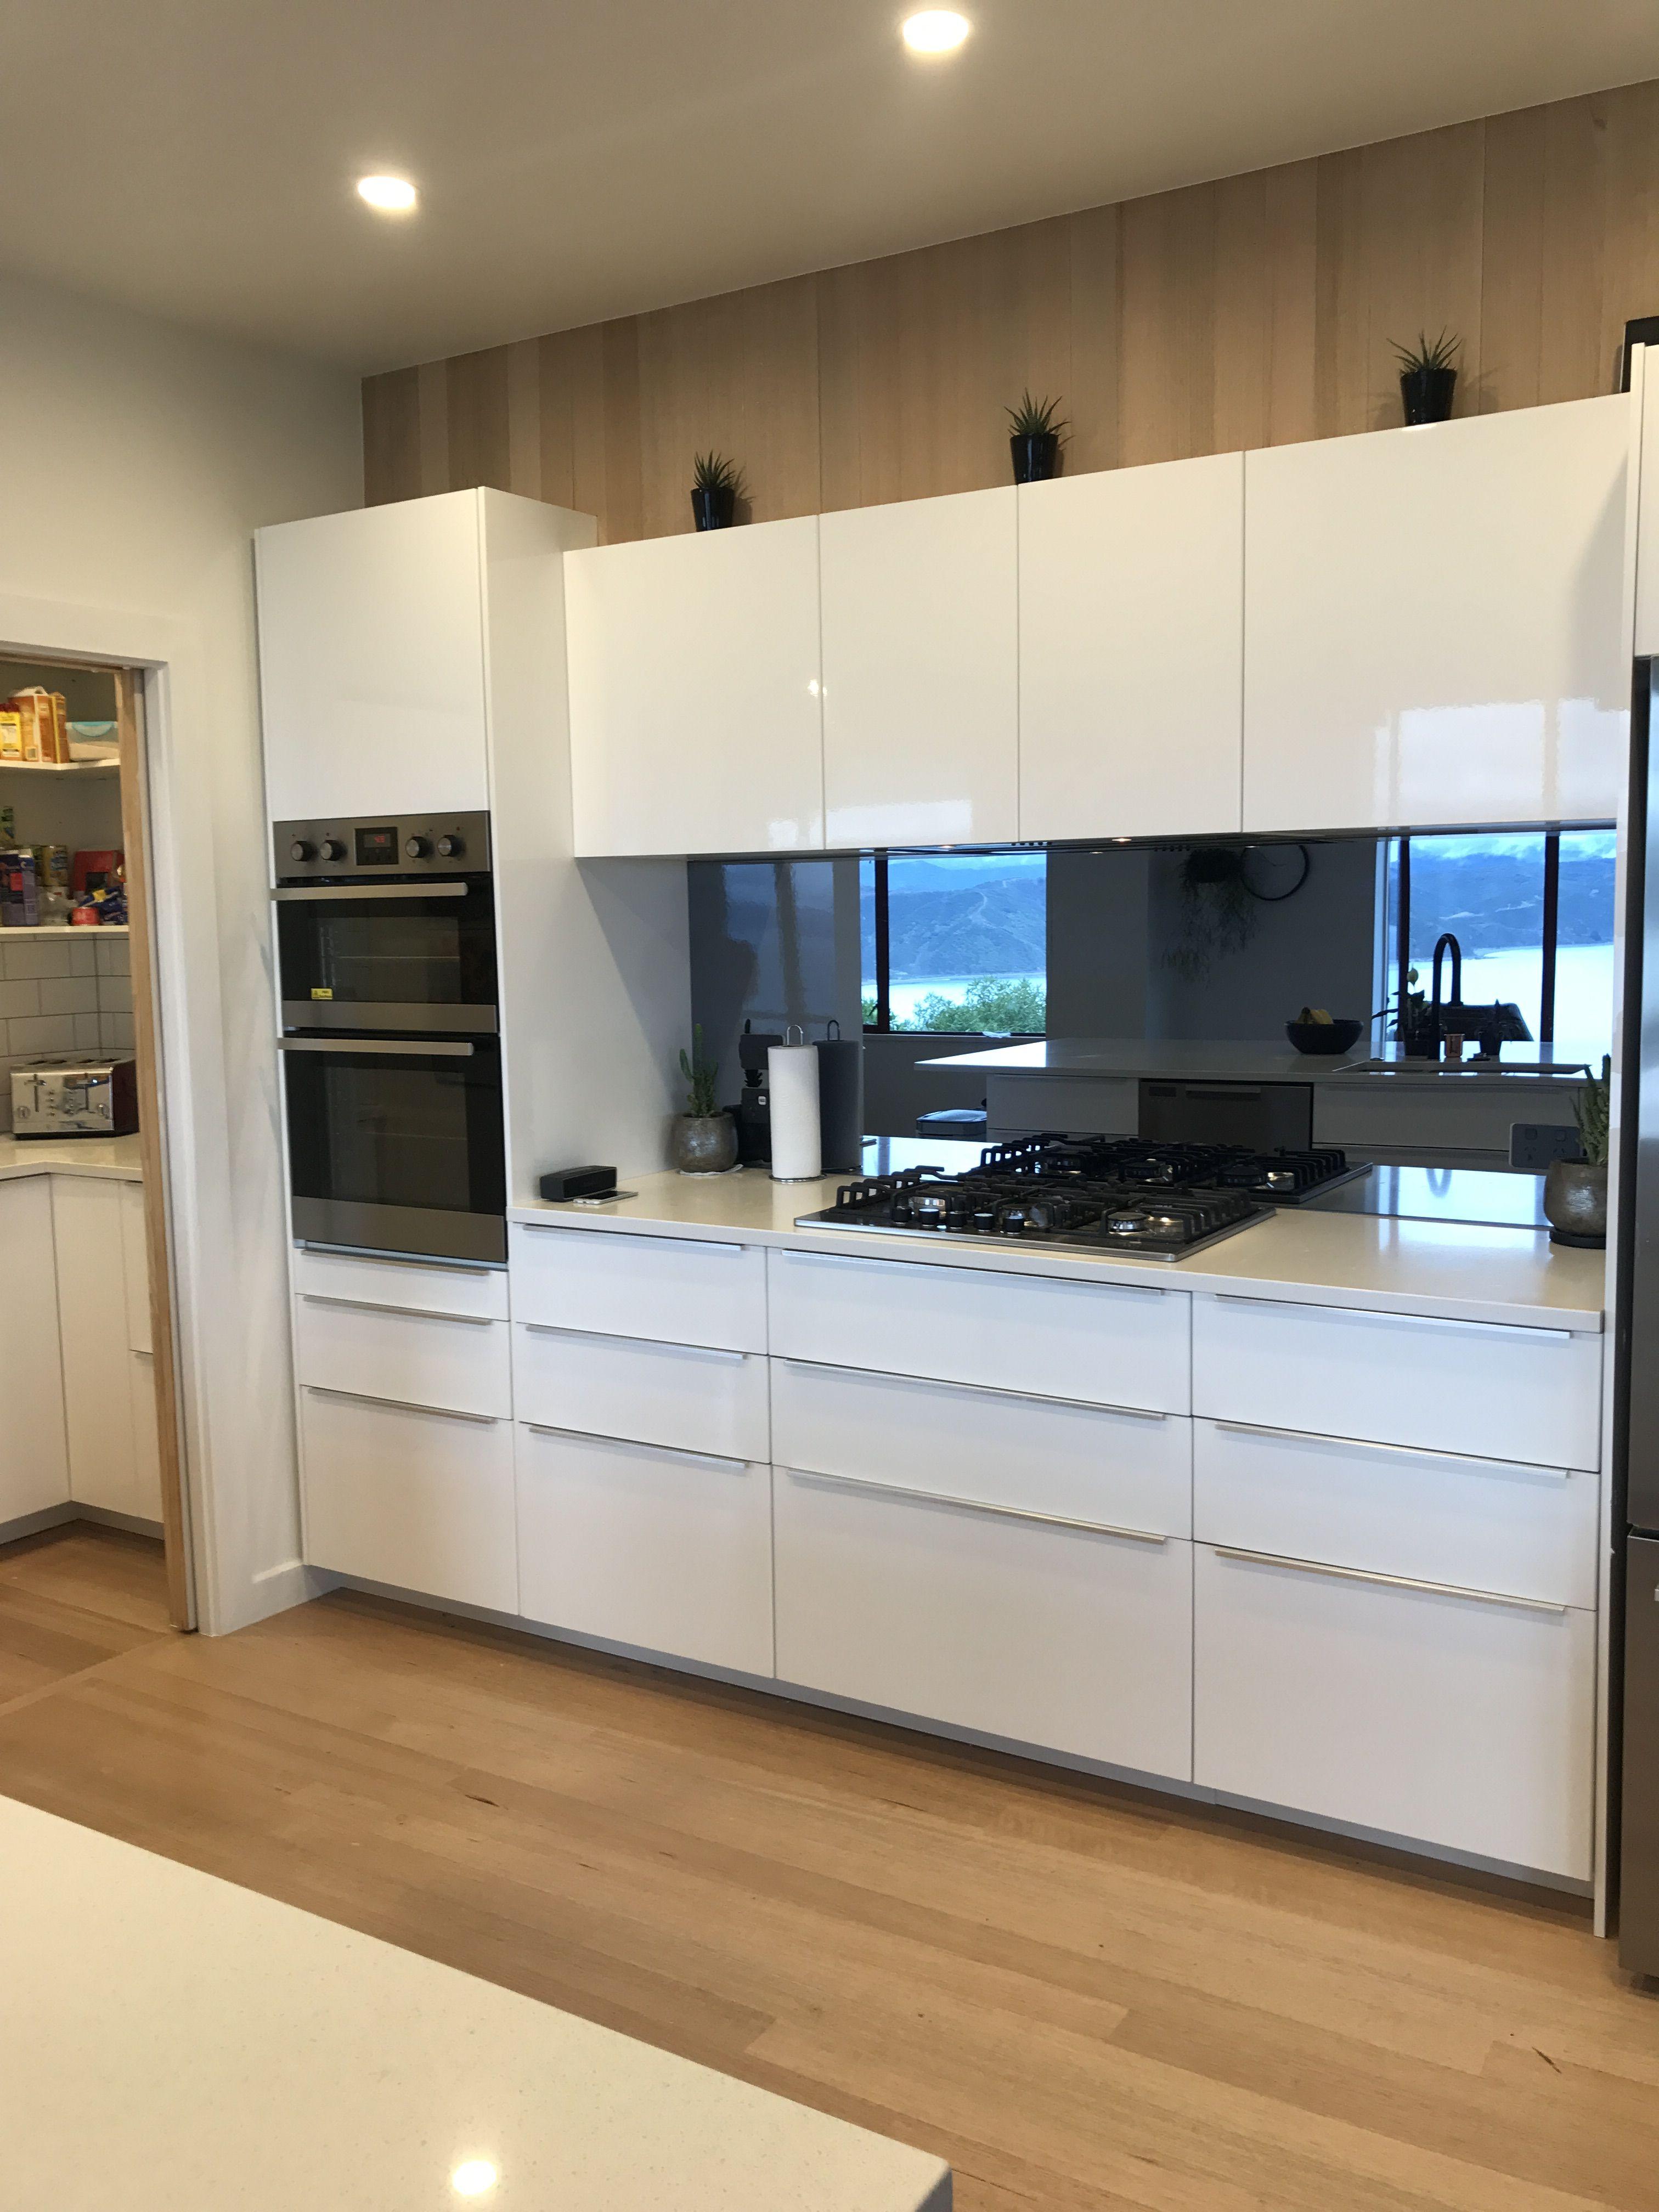 IKEA Kitchen Frosted mirror splash back  Ikea kitchen, Kitchen